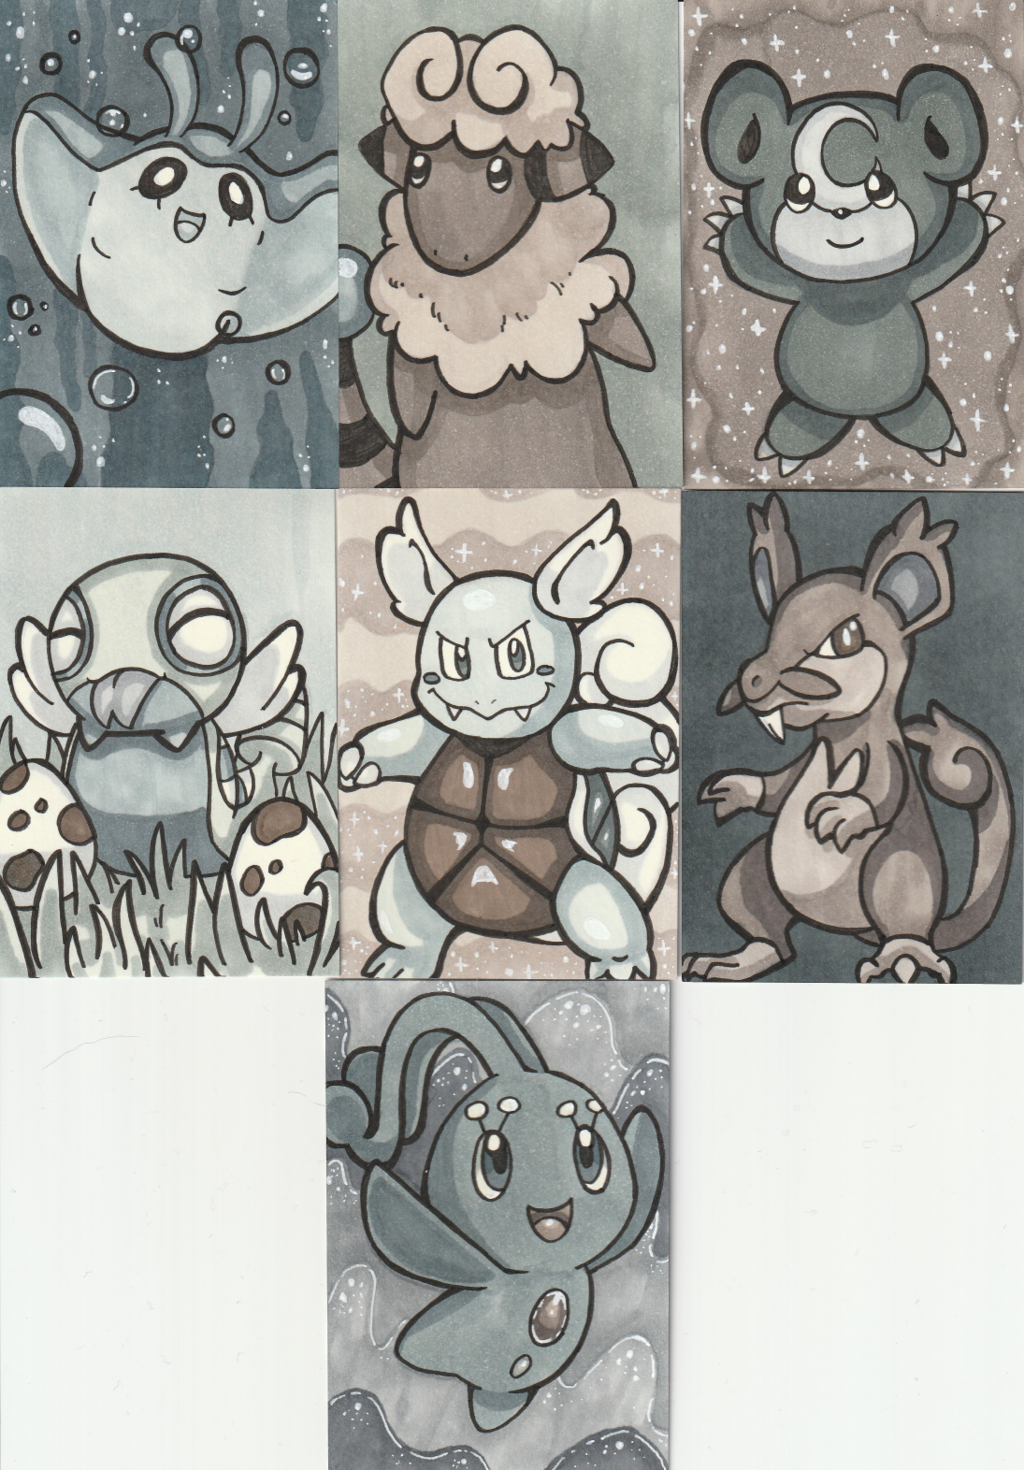 ATC that's a lot of pokemon